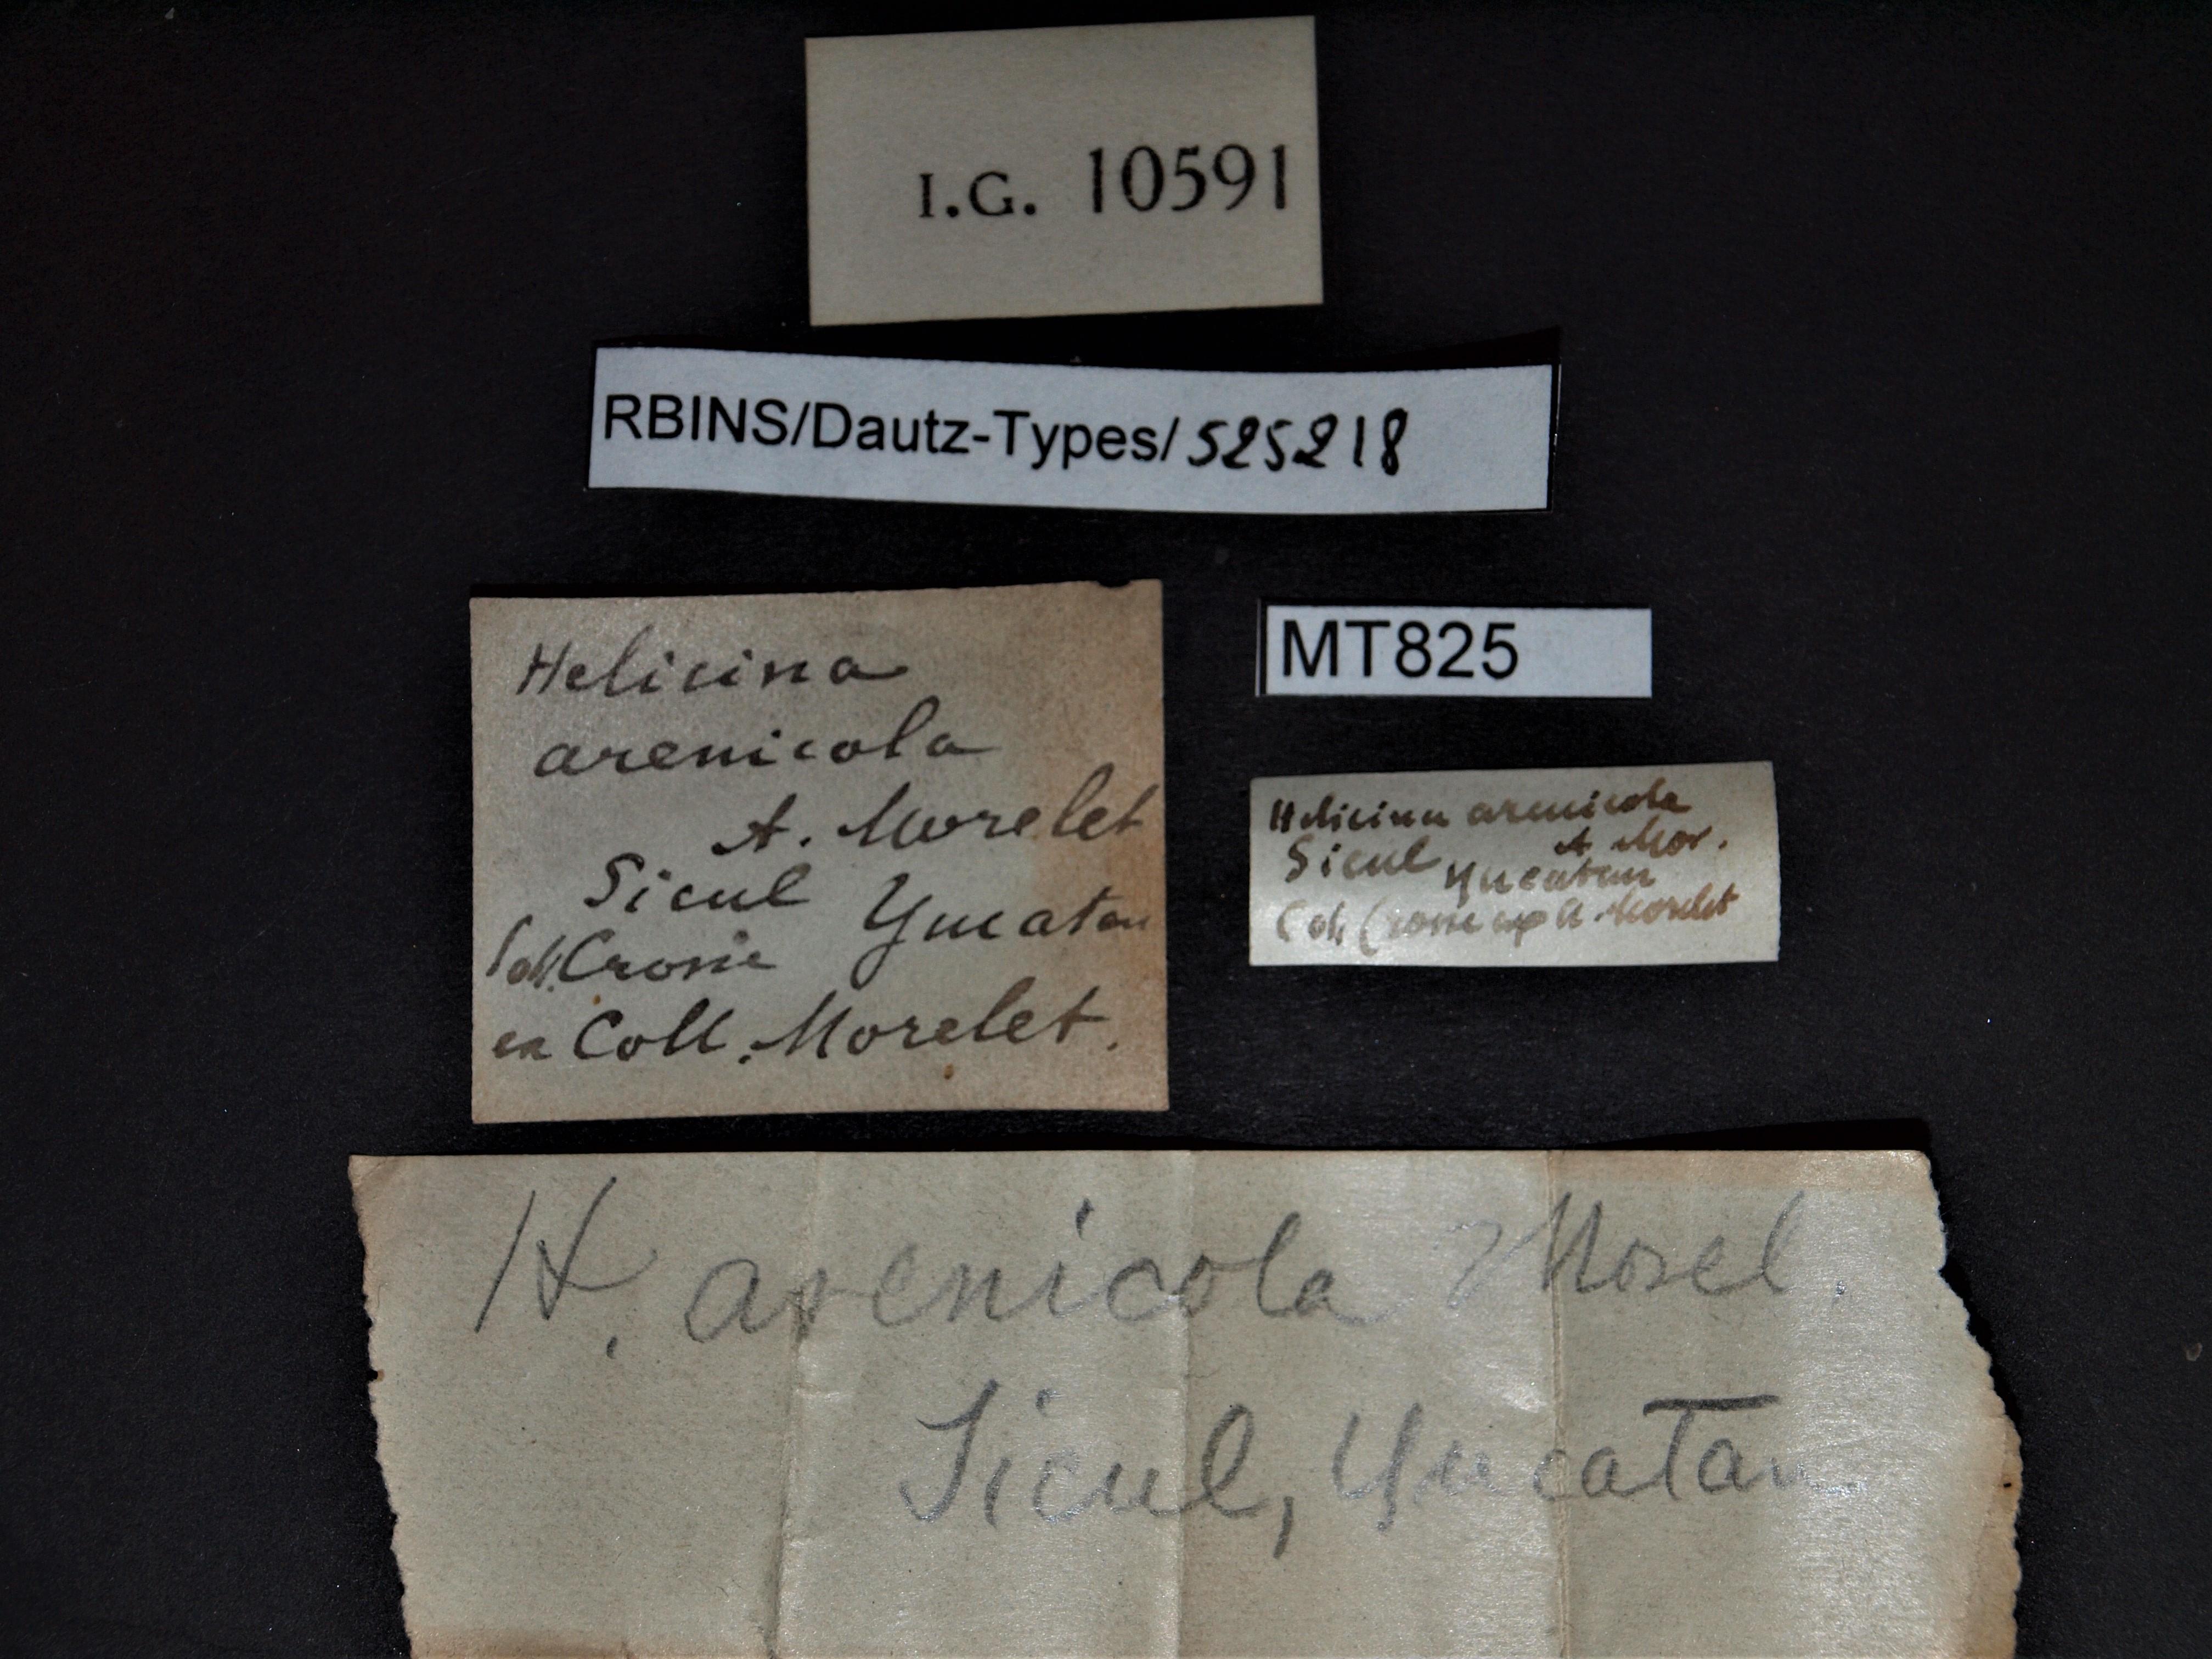 Helicina arenicola pt.JPG